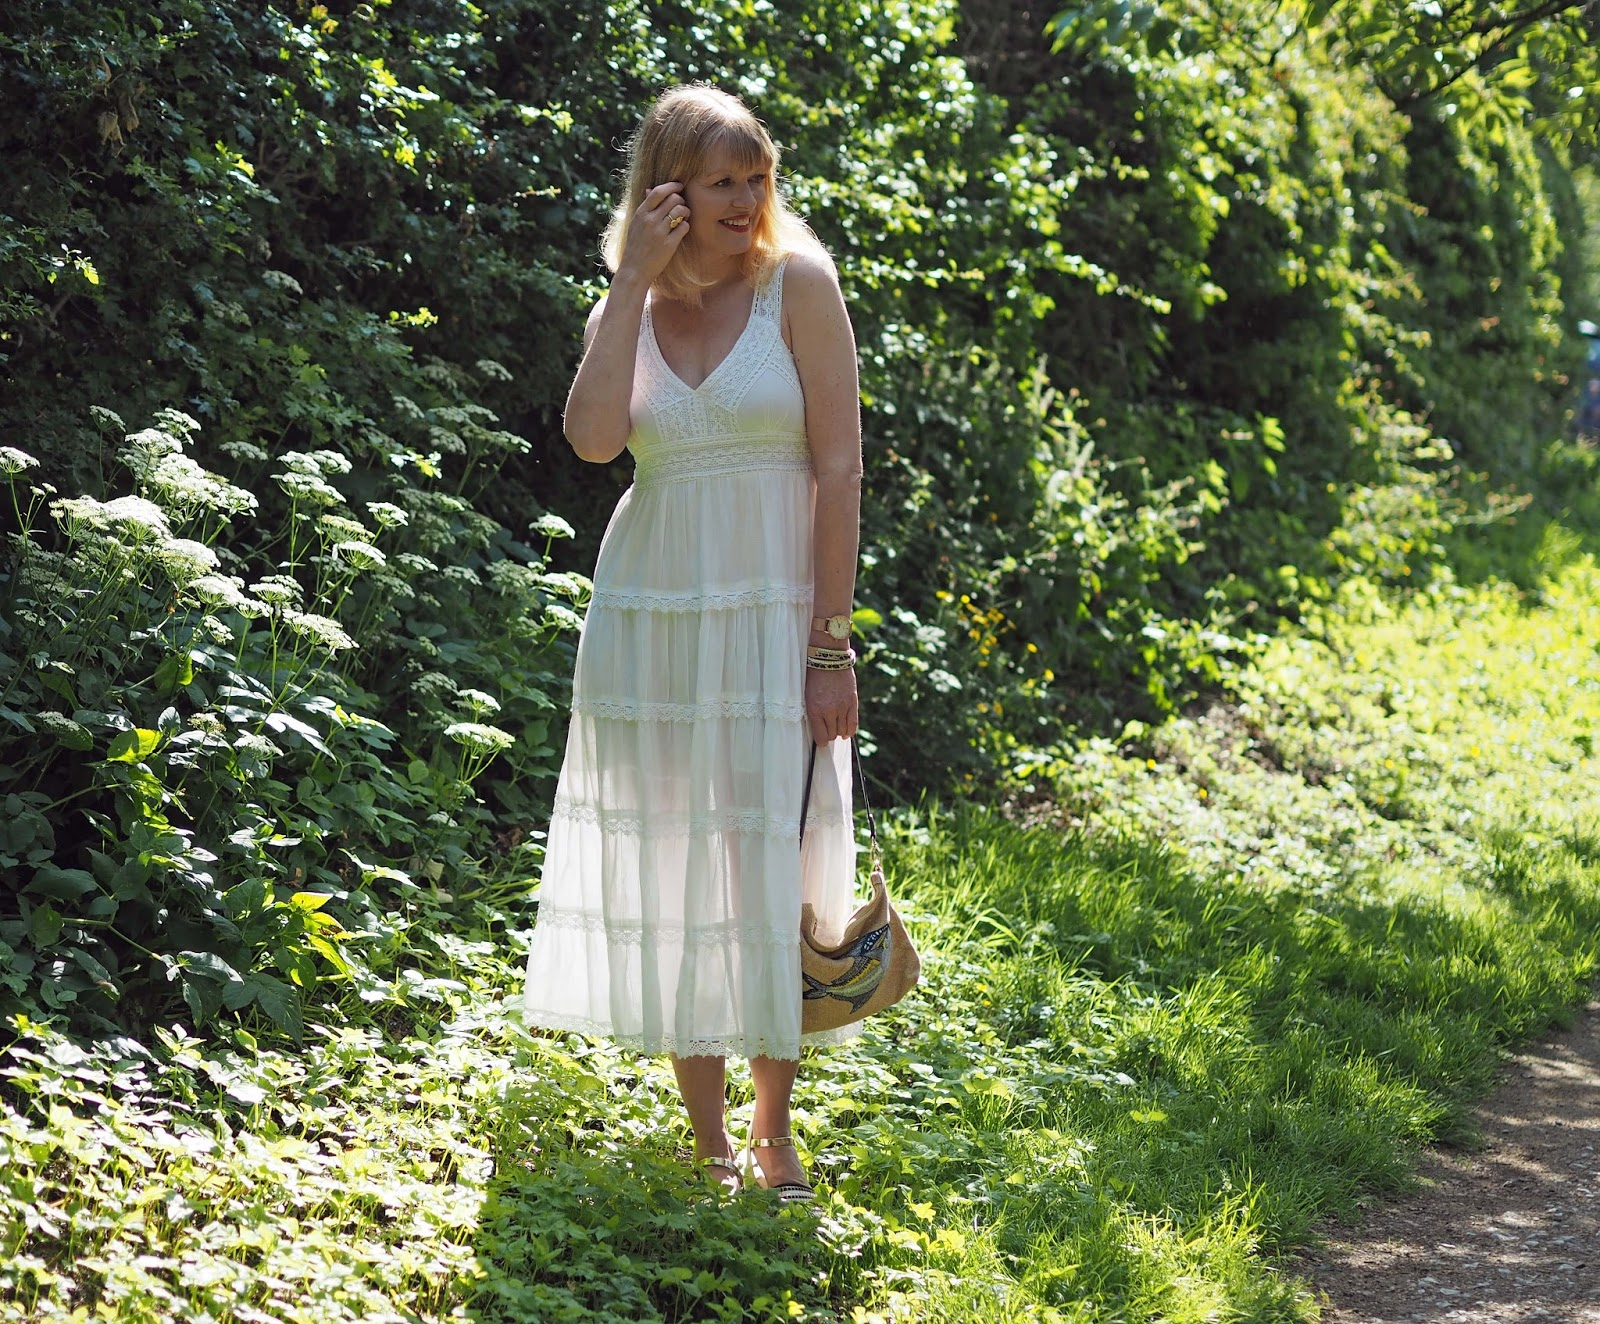 white lace midi dress with espadrilles, Louella Odie fish pouch bag